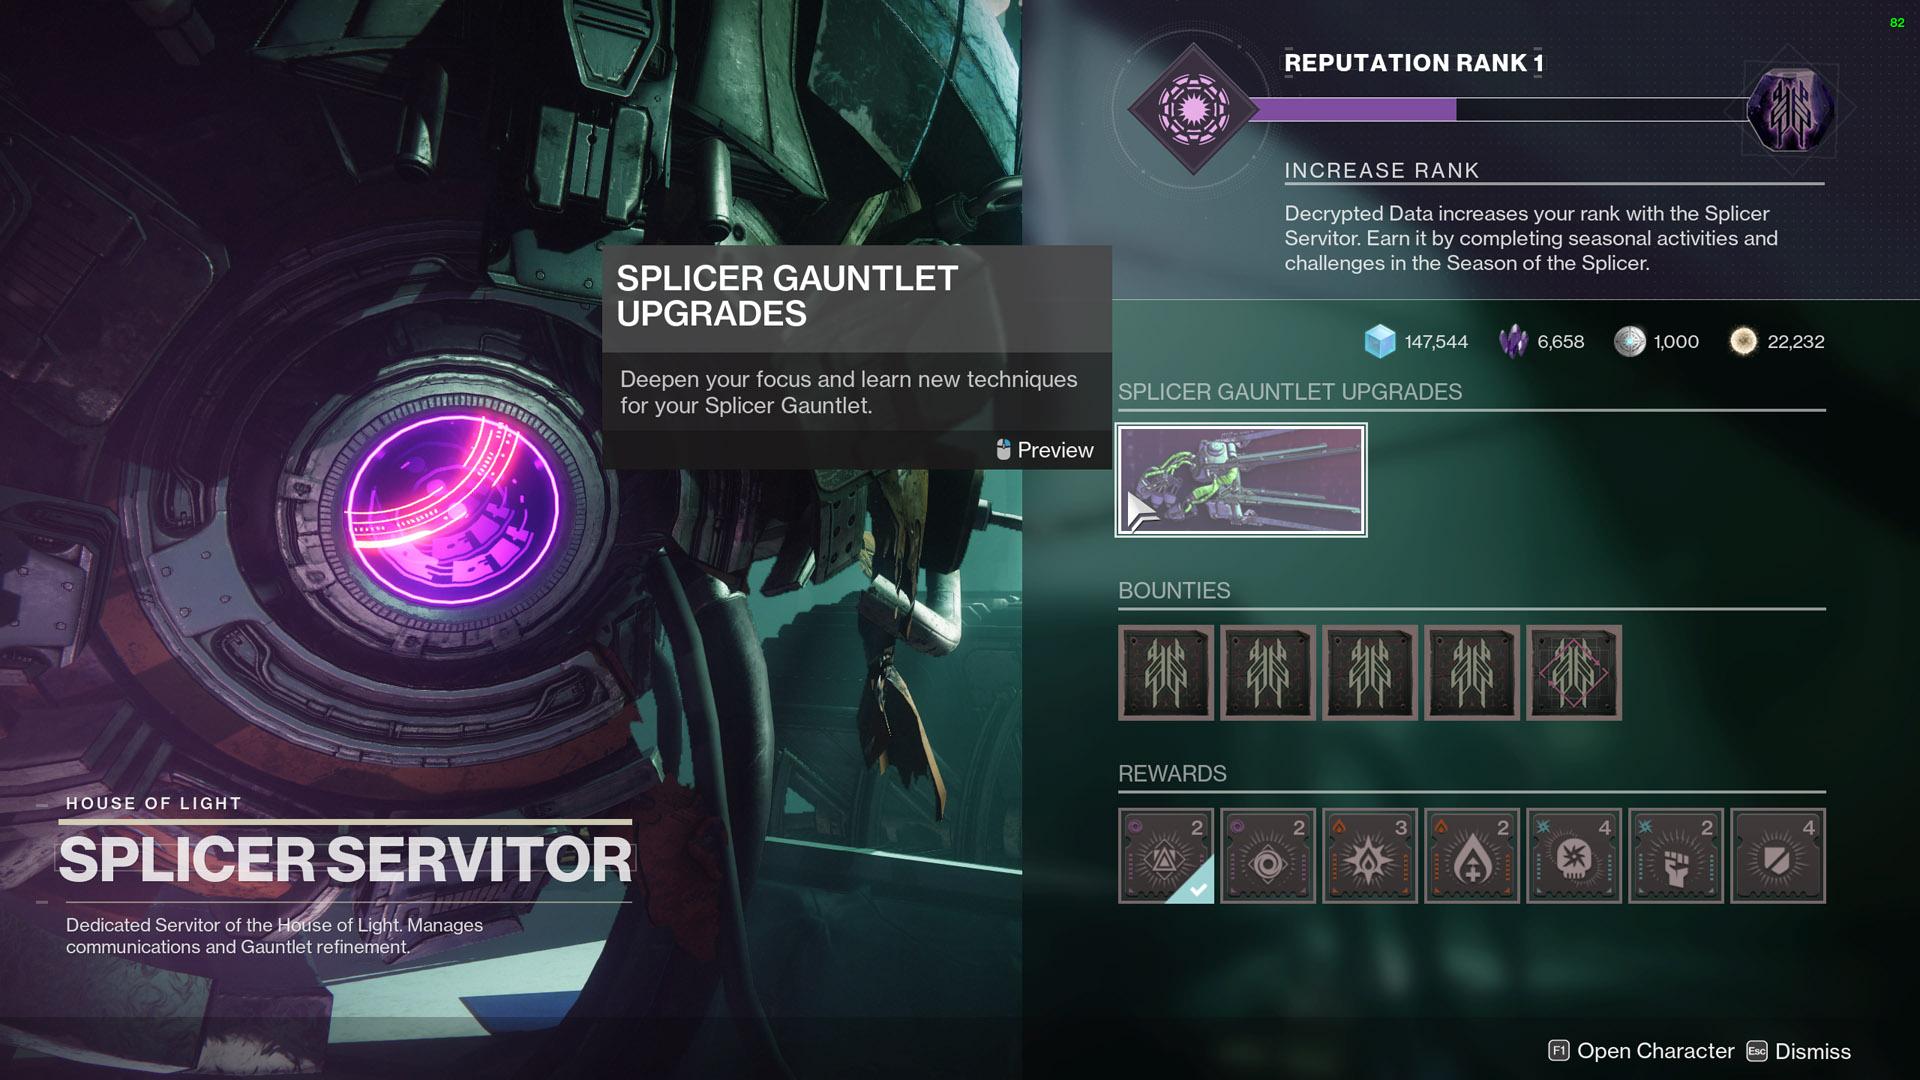 destiny 2 season of the splicer upgrade splicer gauntlet